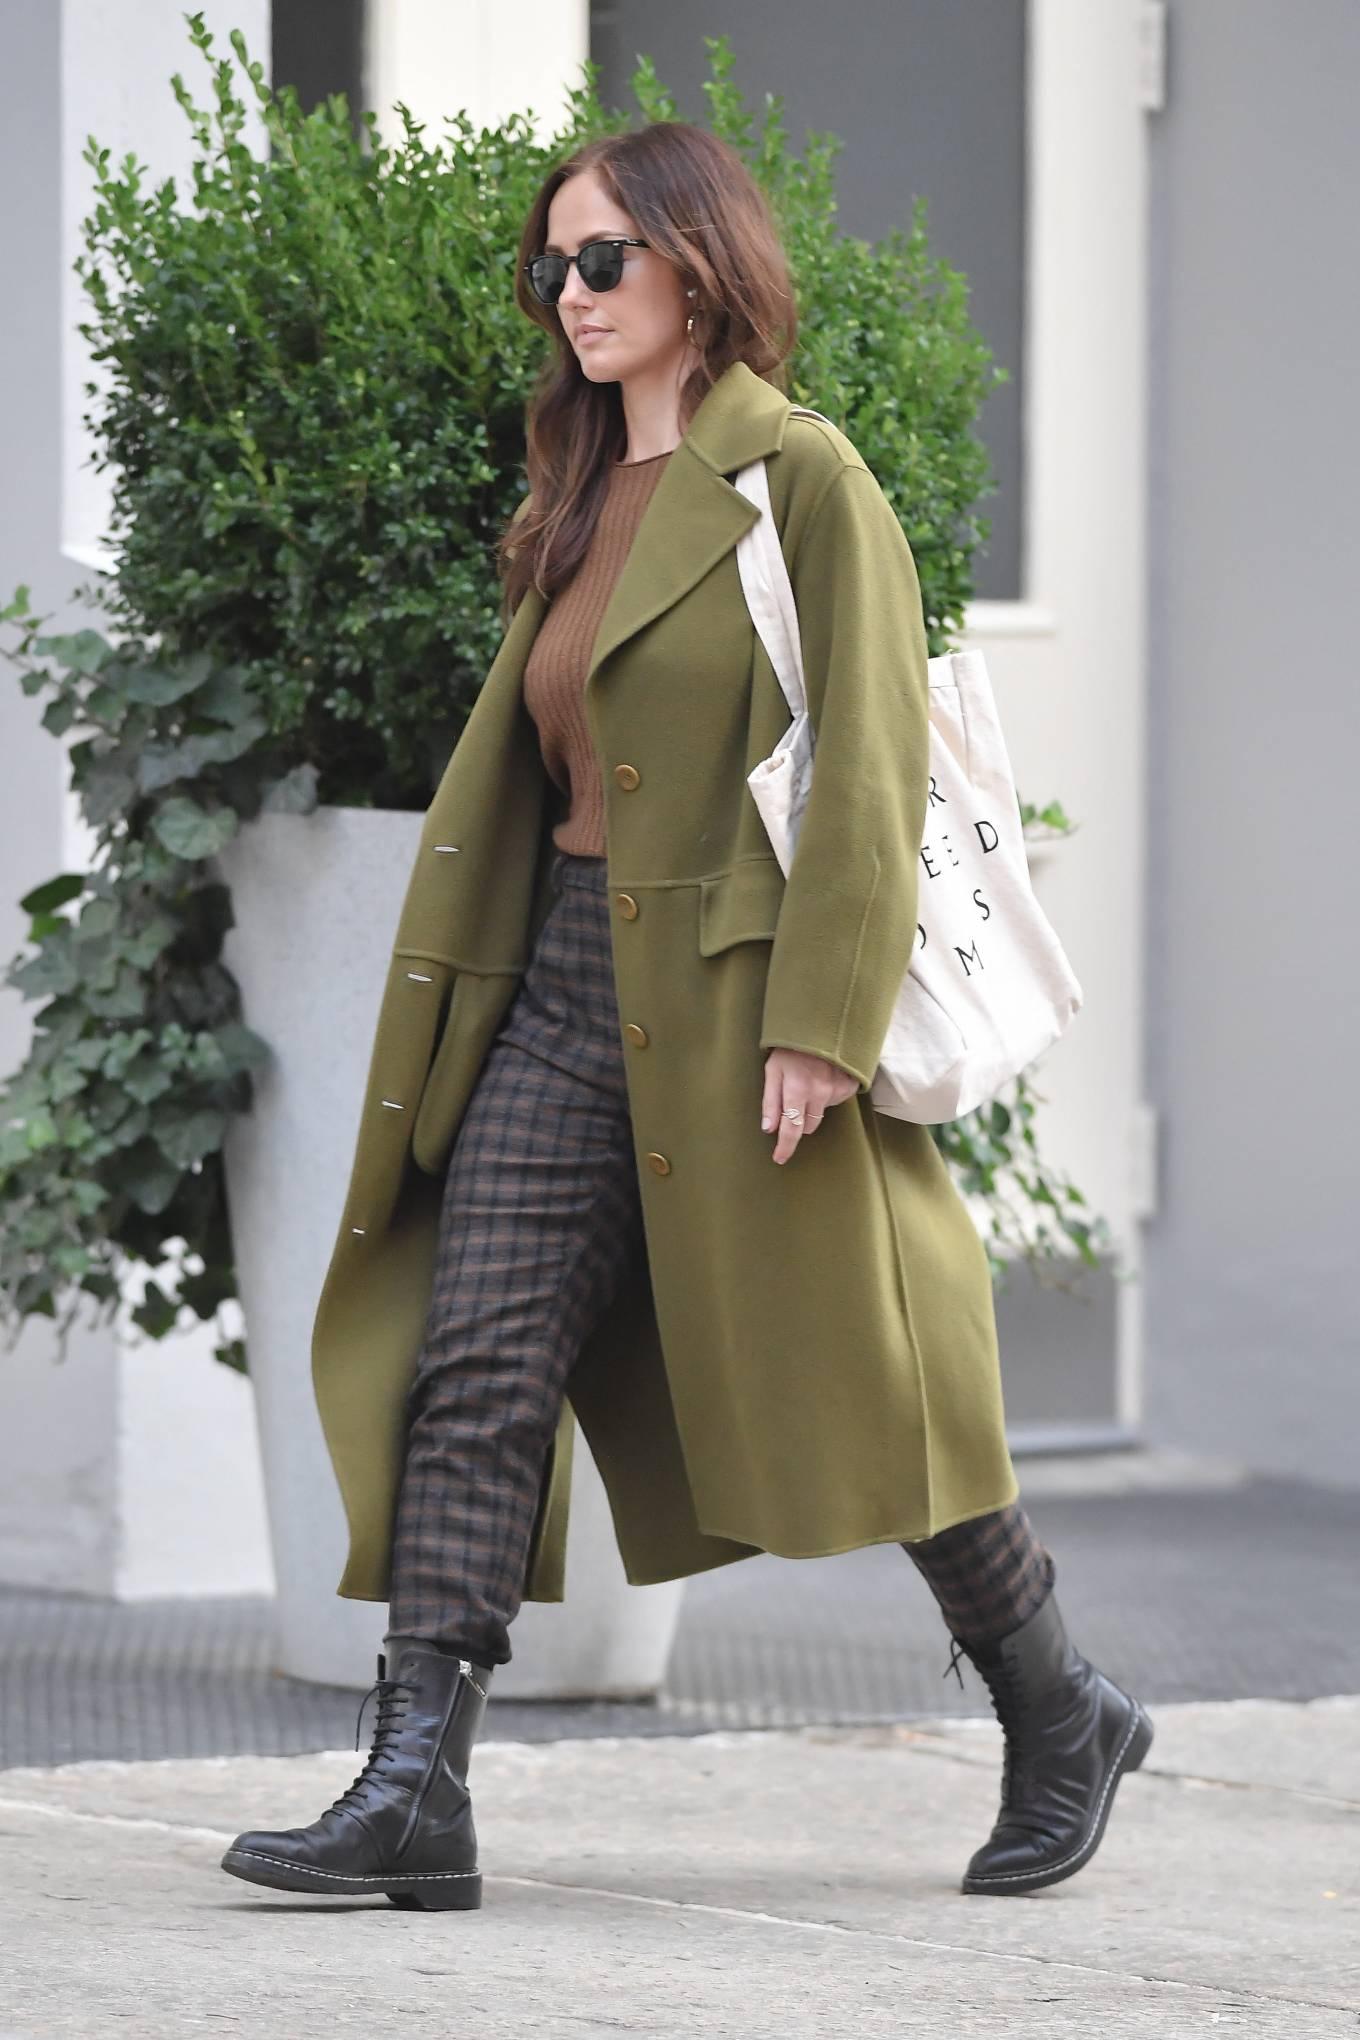 Minka Kelly 2021 : Minka Kelly – In olive green runs errands in New York-15